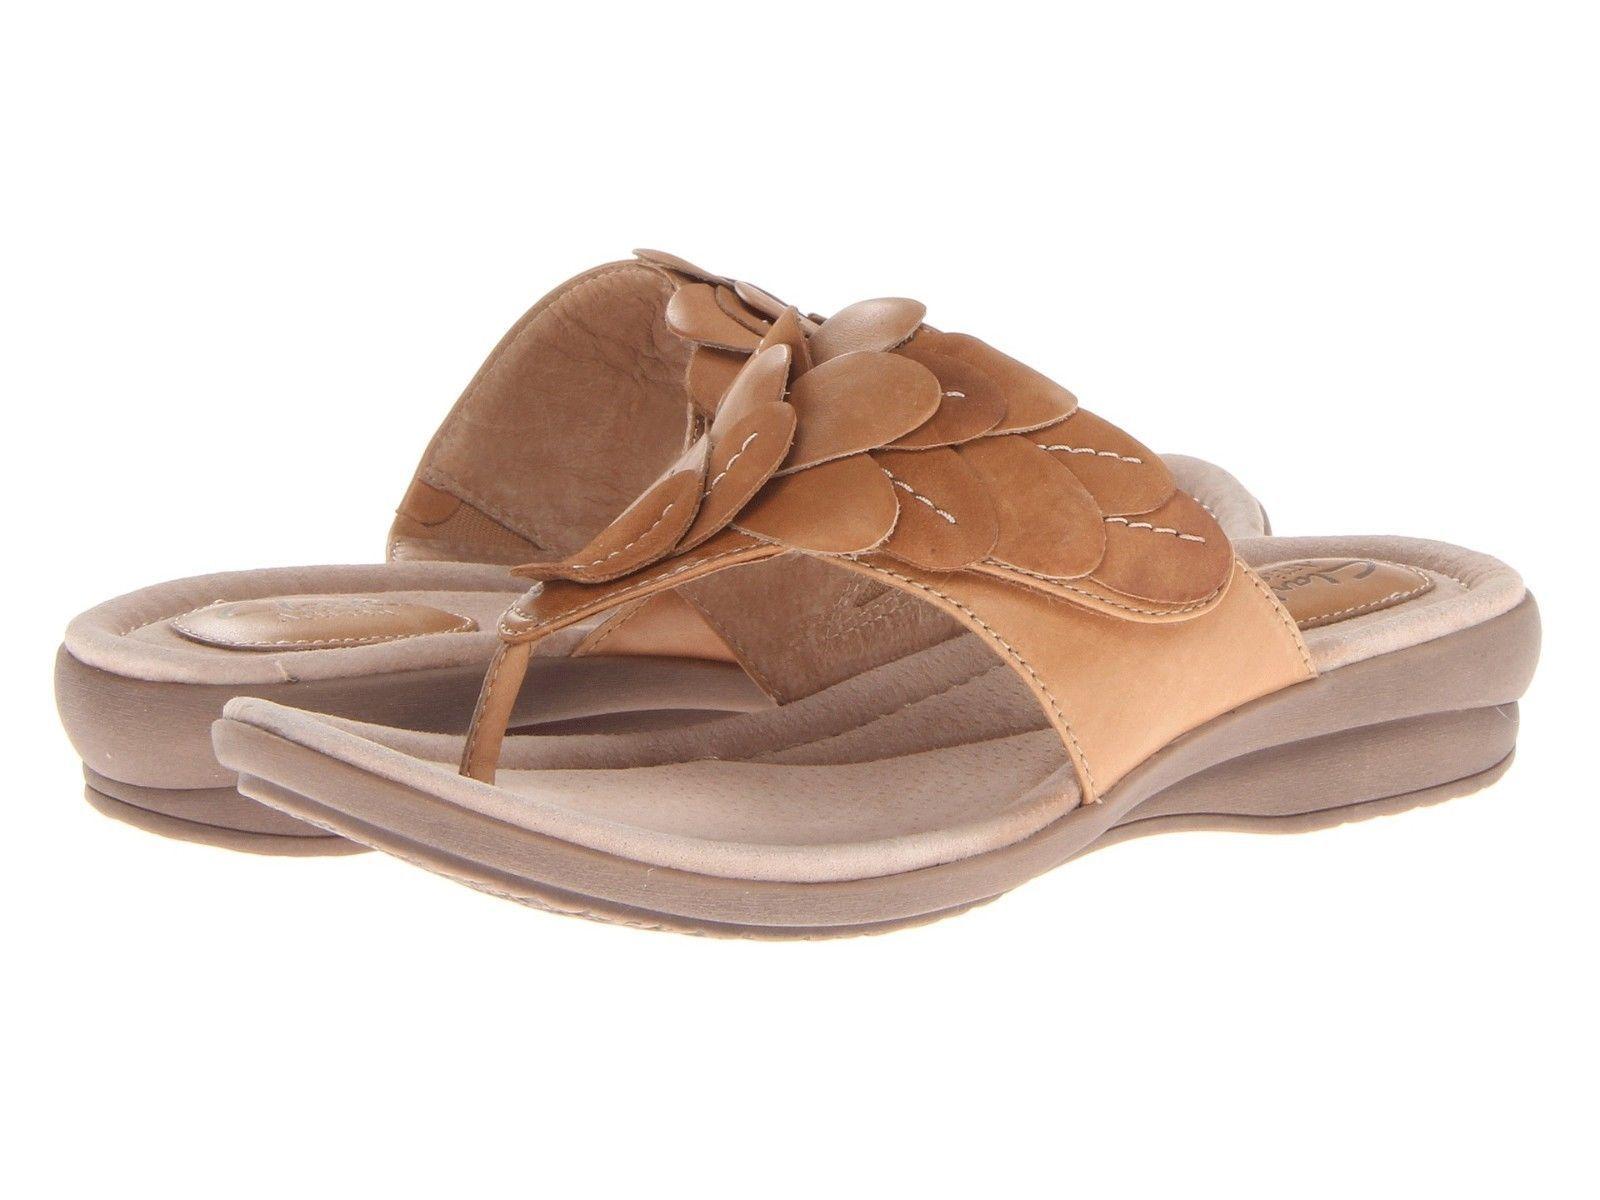 bd75893a055cfa Clarks Reid Ricki Sand Leather Floral Womens Sandals 68487 BNIB ...